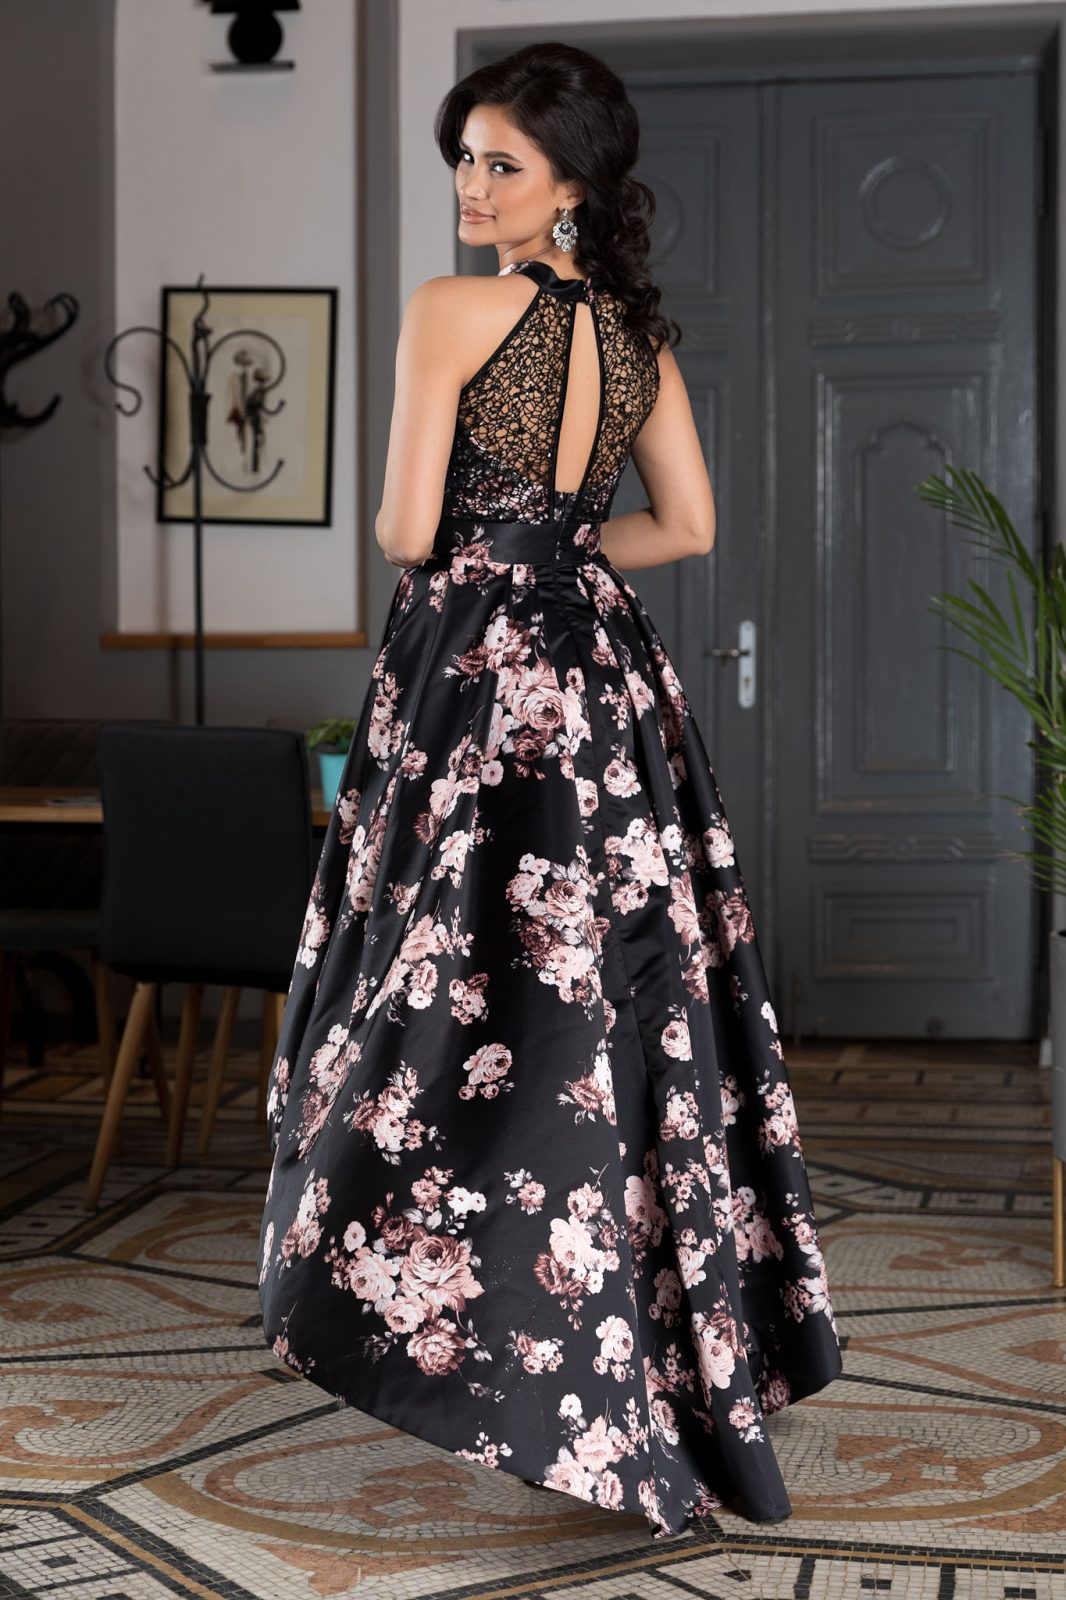 Oving Floral Φόρεμα 5562